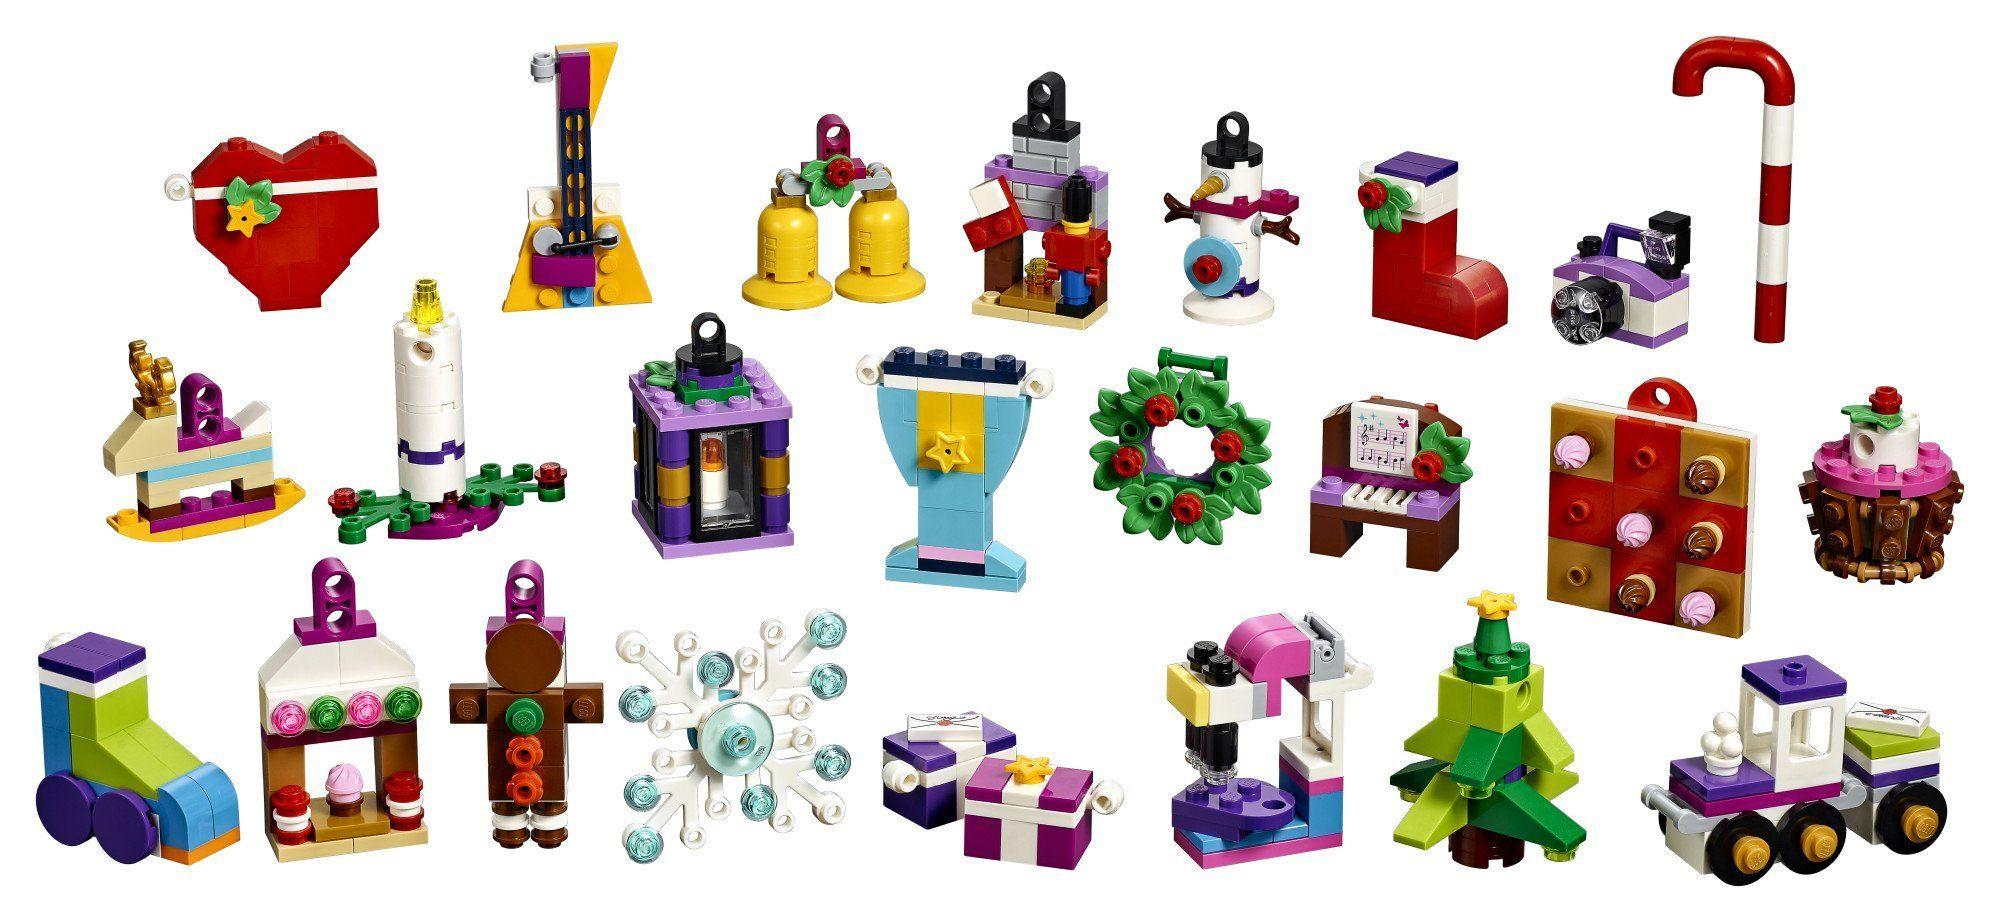 Lego Friends Advent Calendar 41353 New 2018 Edition Small Building Toys Christmas Countdown Calen Lego Advent Calendar Lego Advent Christmas Countdown Calendar